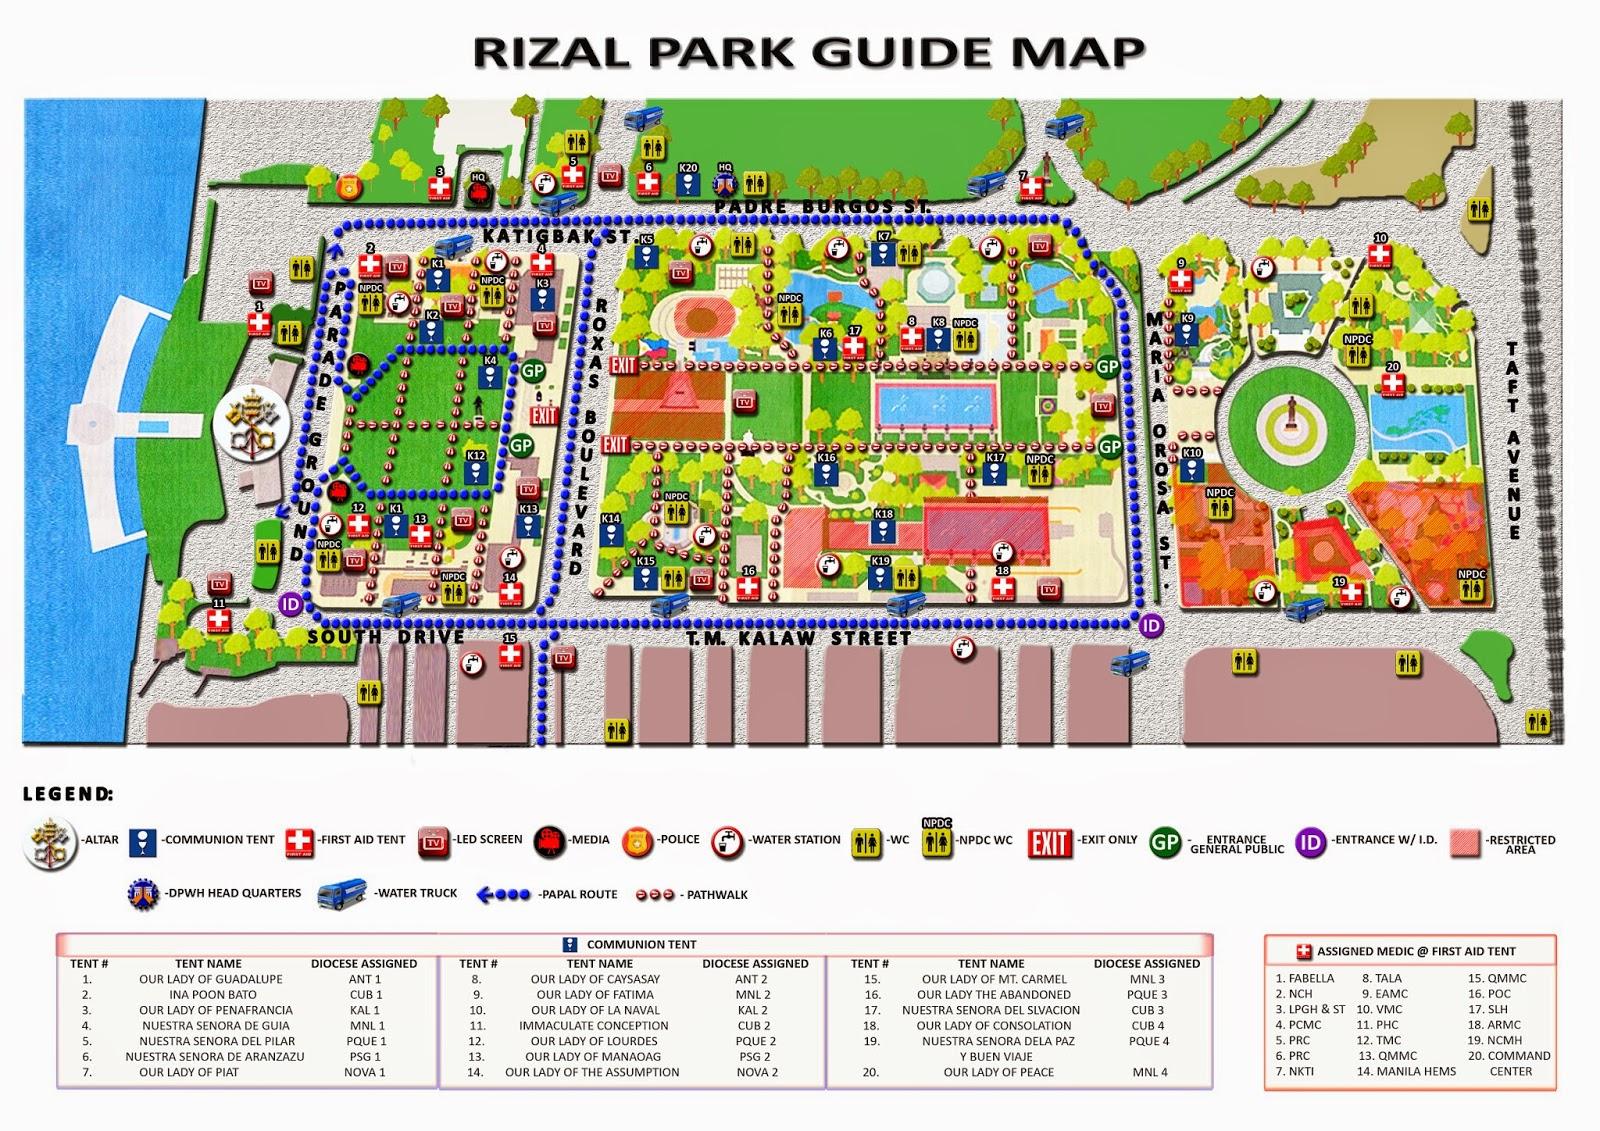 pope francis in Luneta - Rizal Park Manila